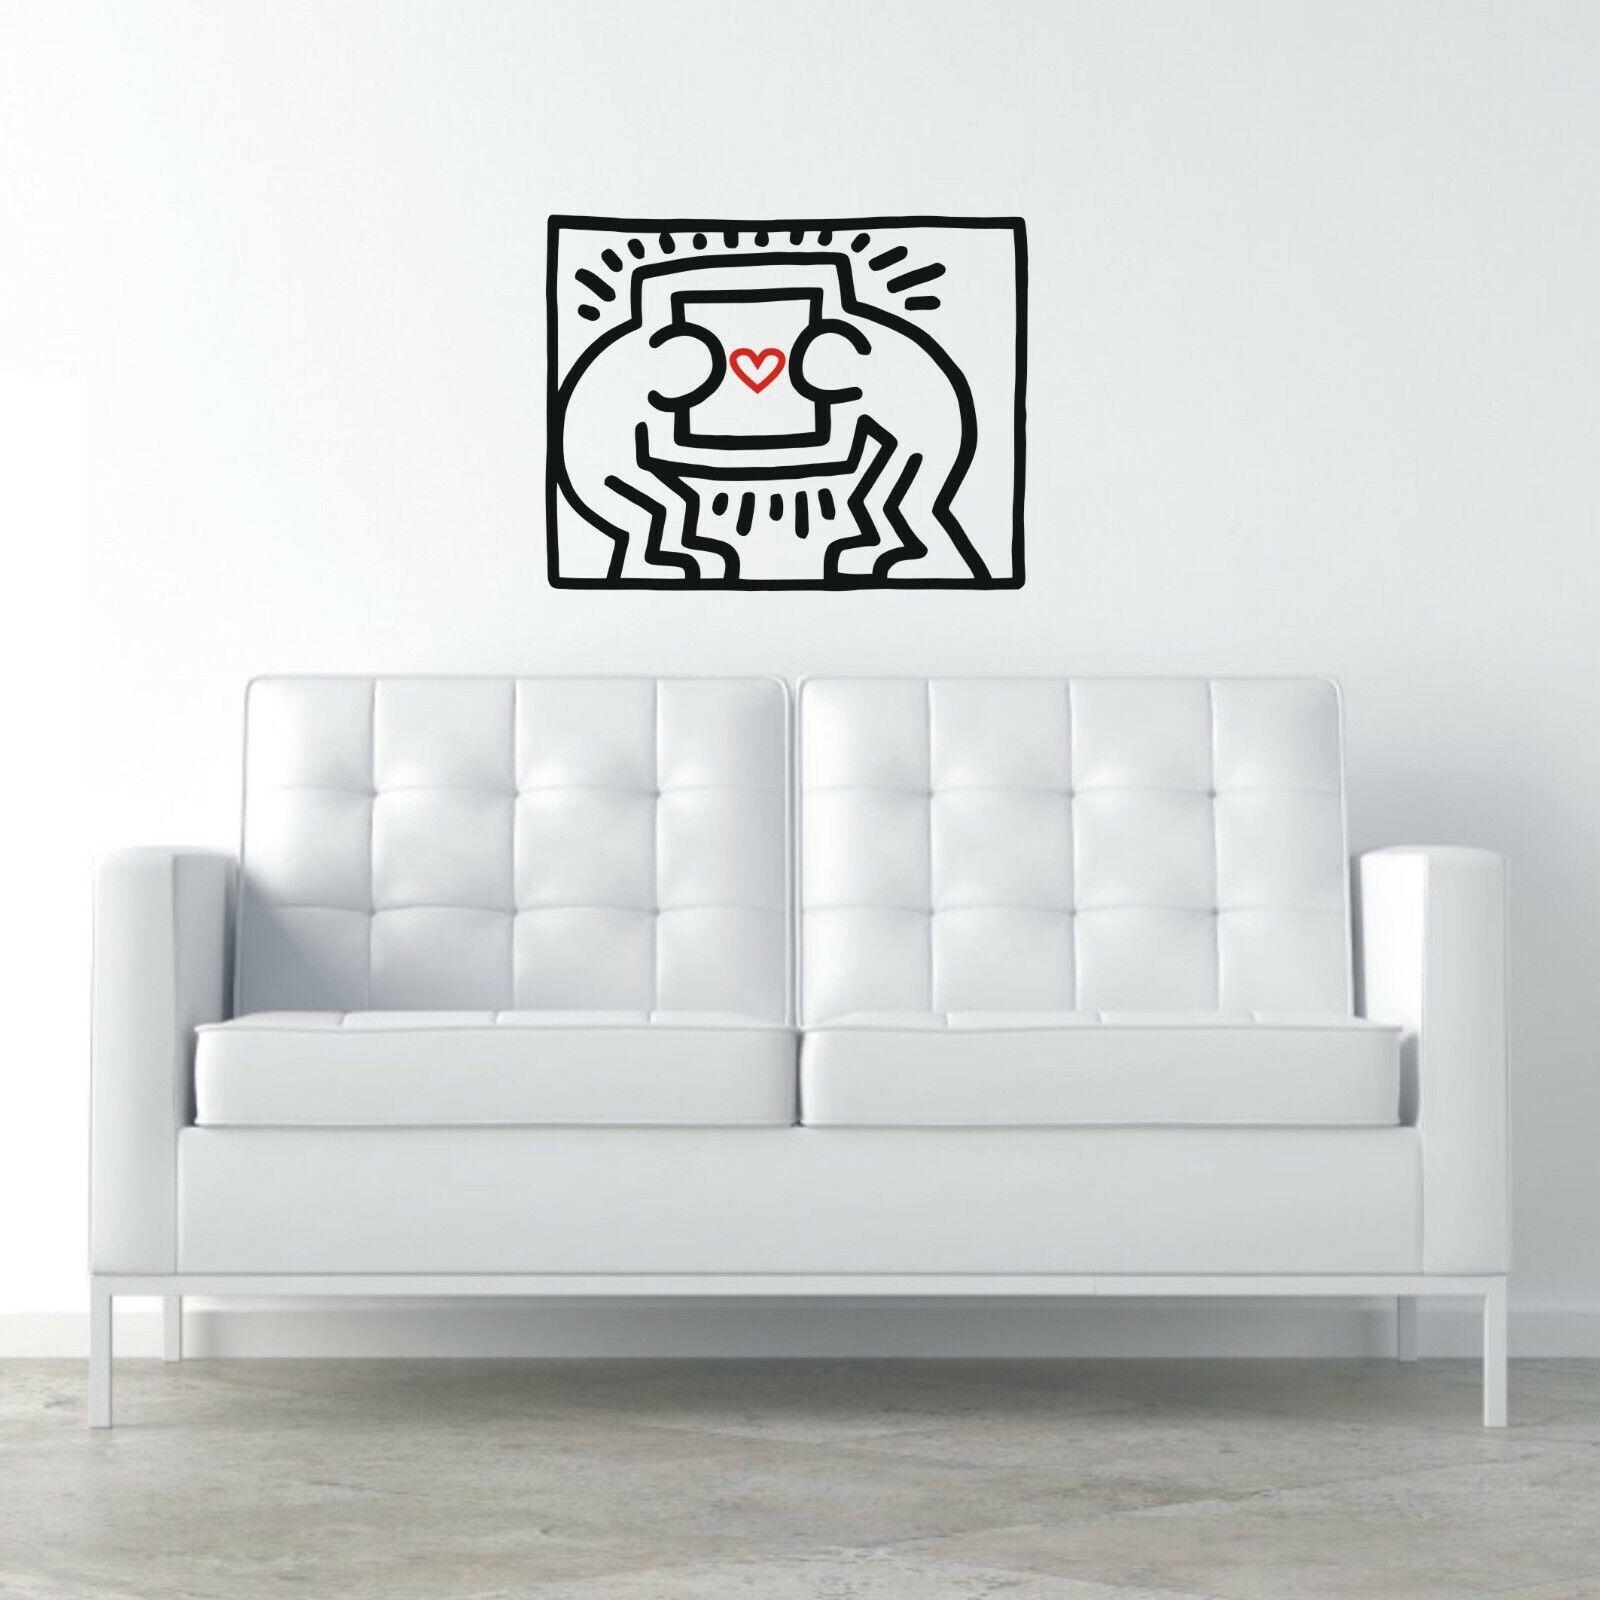 Adesivi Murali Keith Haring.Adesivi Murali Wall Stickers Keith Haring Pop Art Decorazione Parete Muri A0740 Ebay